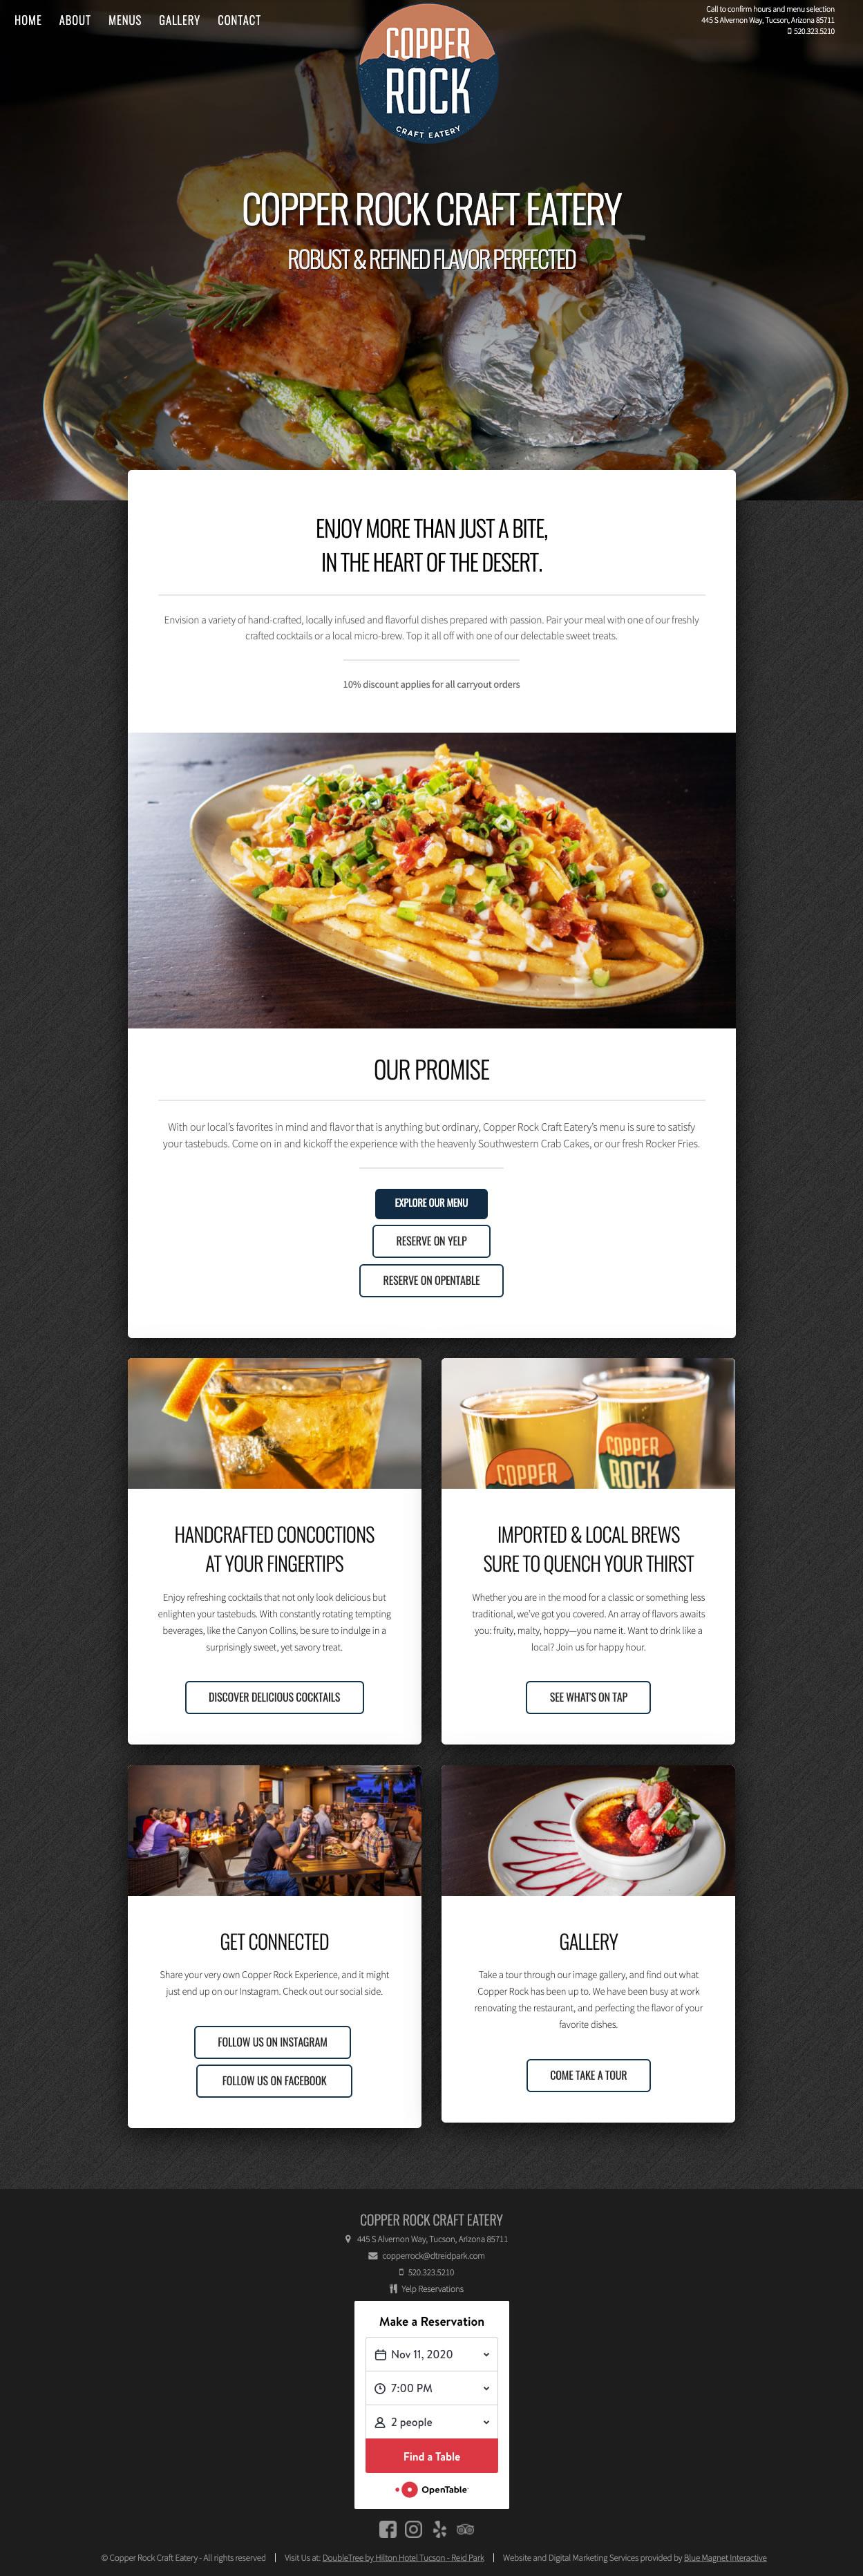 web design example copper rock